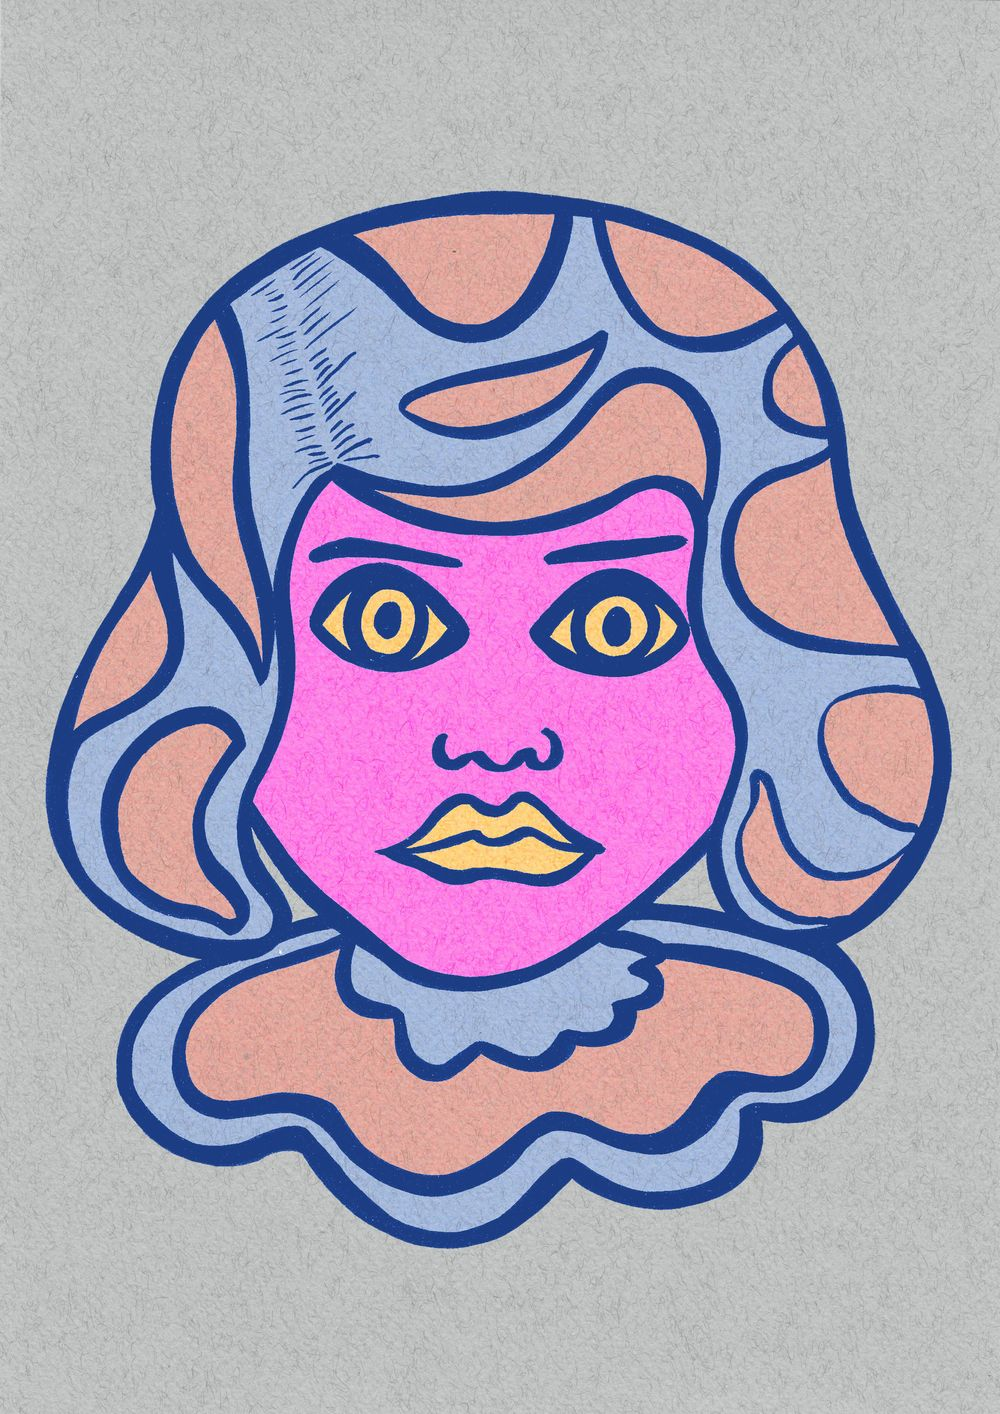 Pop art Girl - image 2 - student project